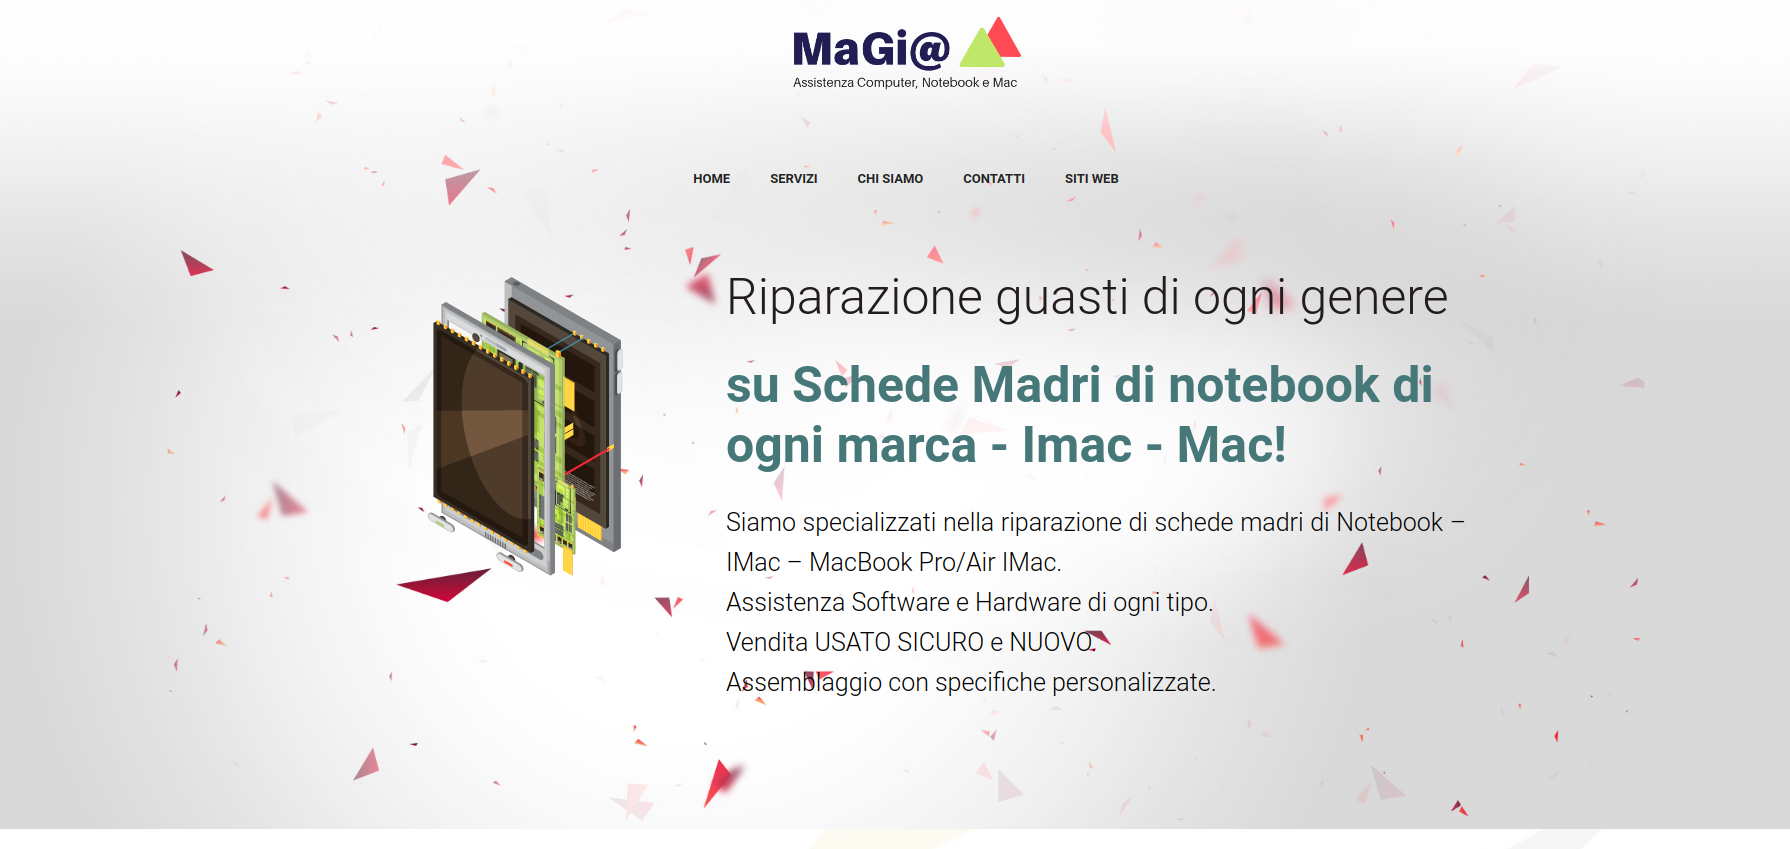 MaGia Computer Torino